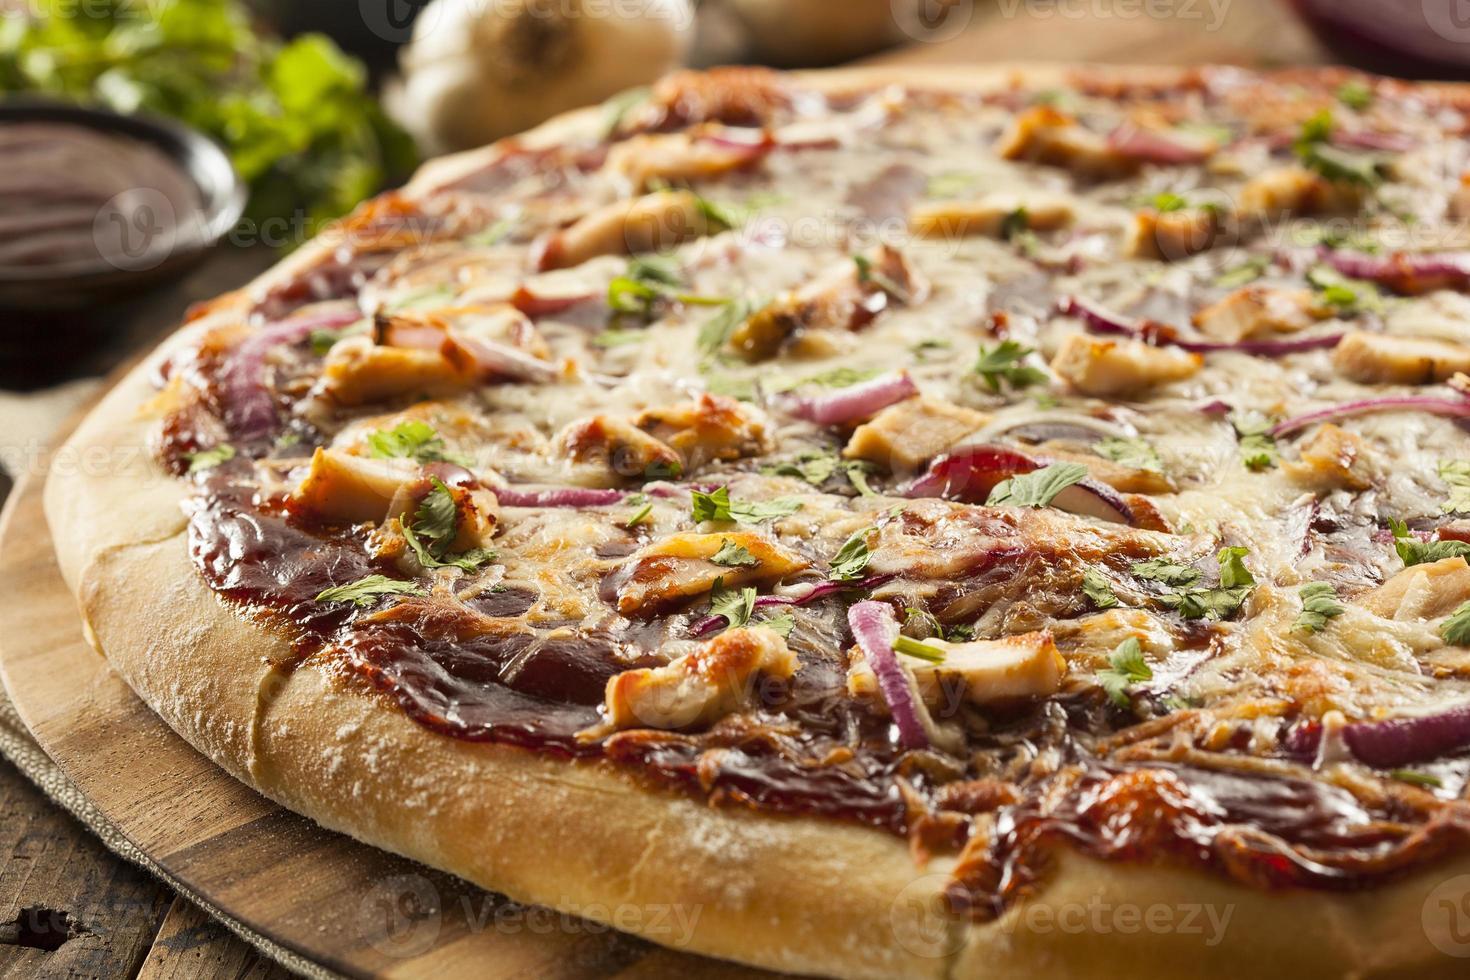 hemlagad grillkycklingpizza foto